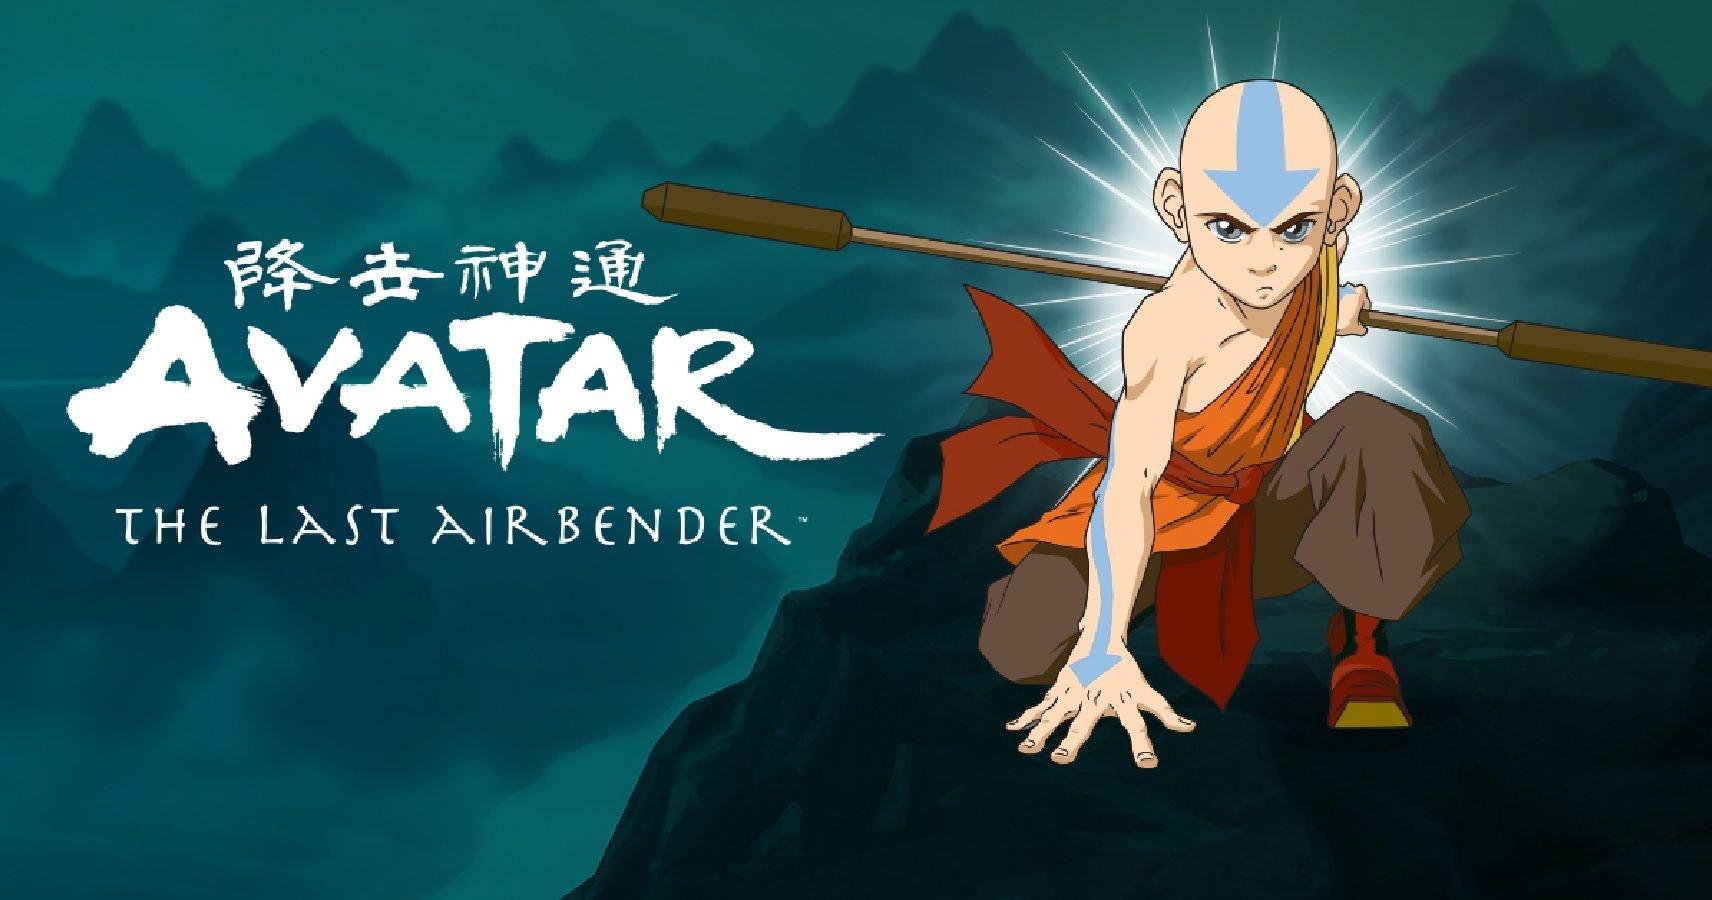 Nickelodeon Announces Avatar Studios, Expanding Last Airbender & Legend of Korra